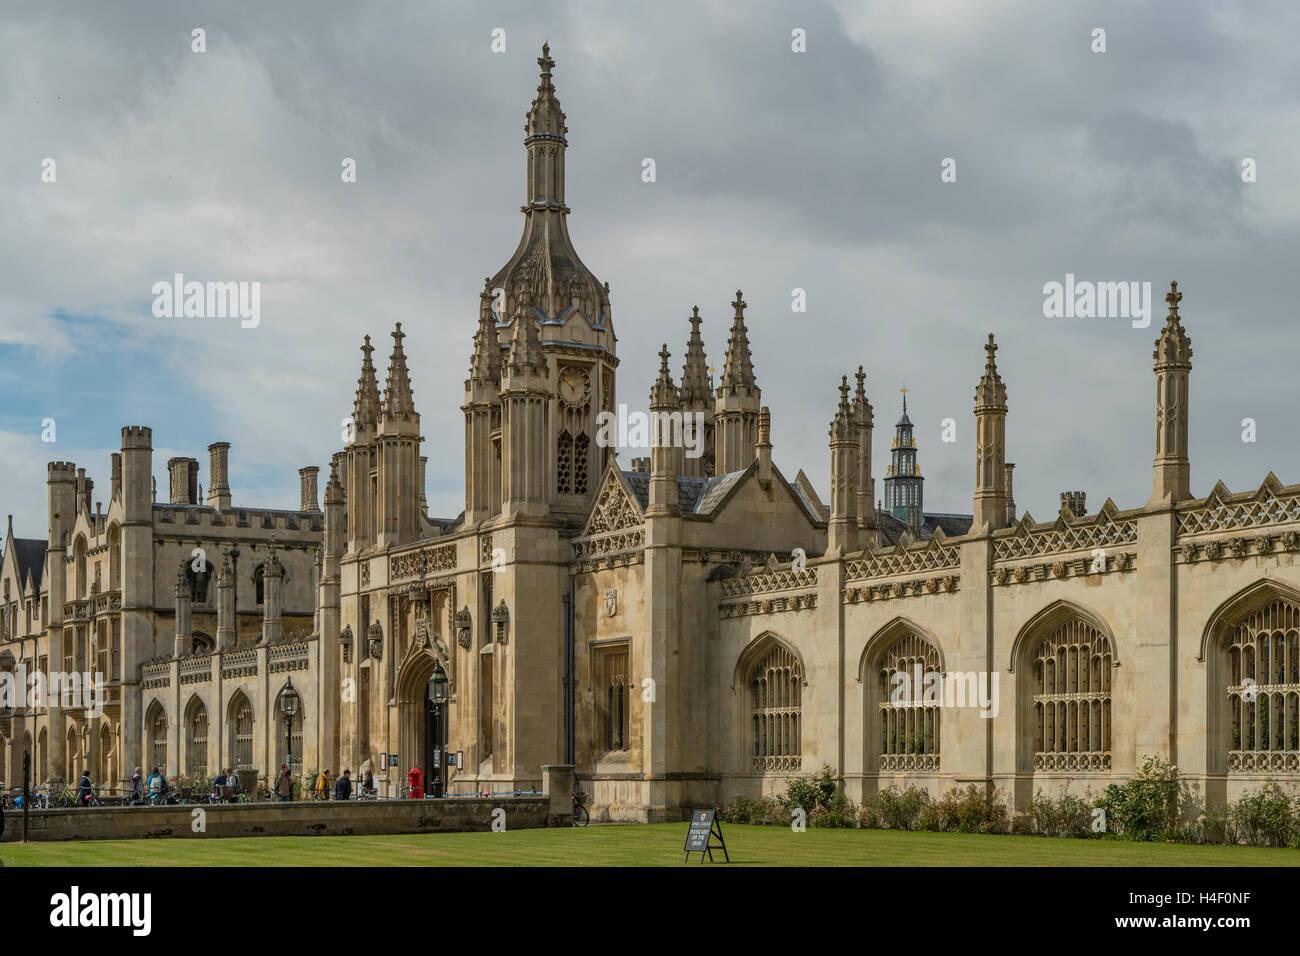 King's College, Cambridge, Cambridgeshire, England - Stock Image